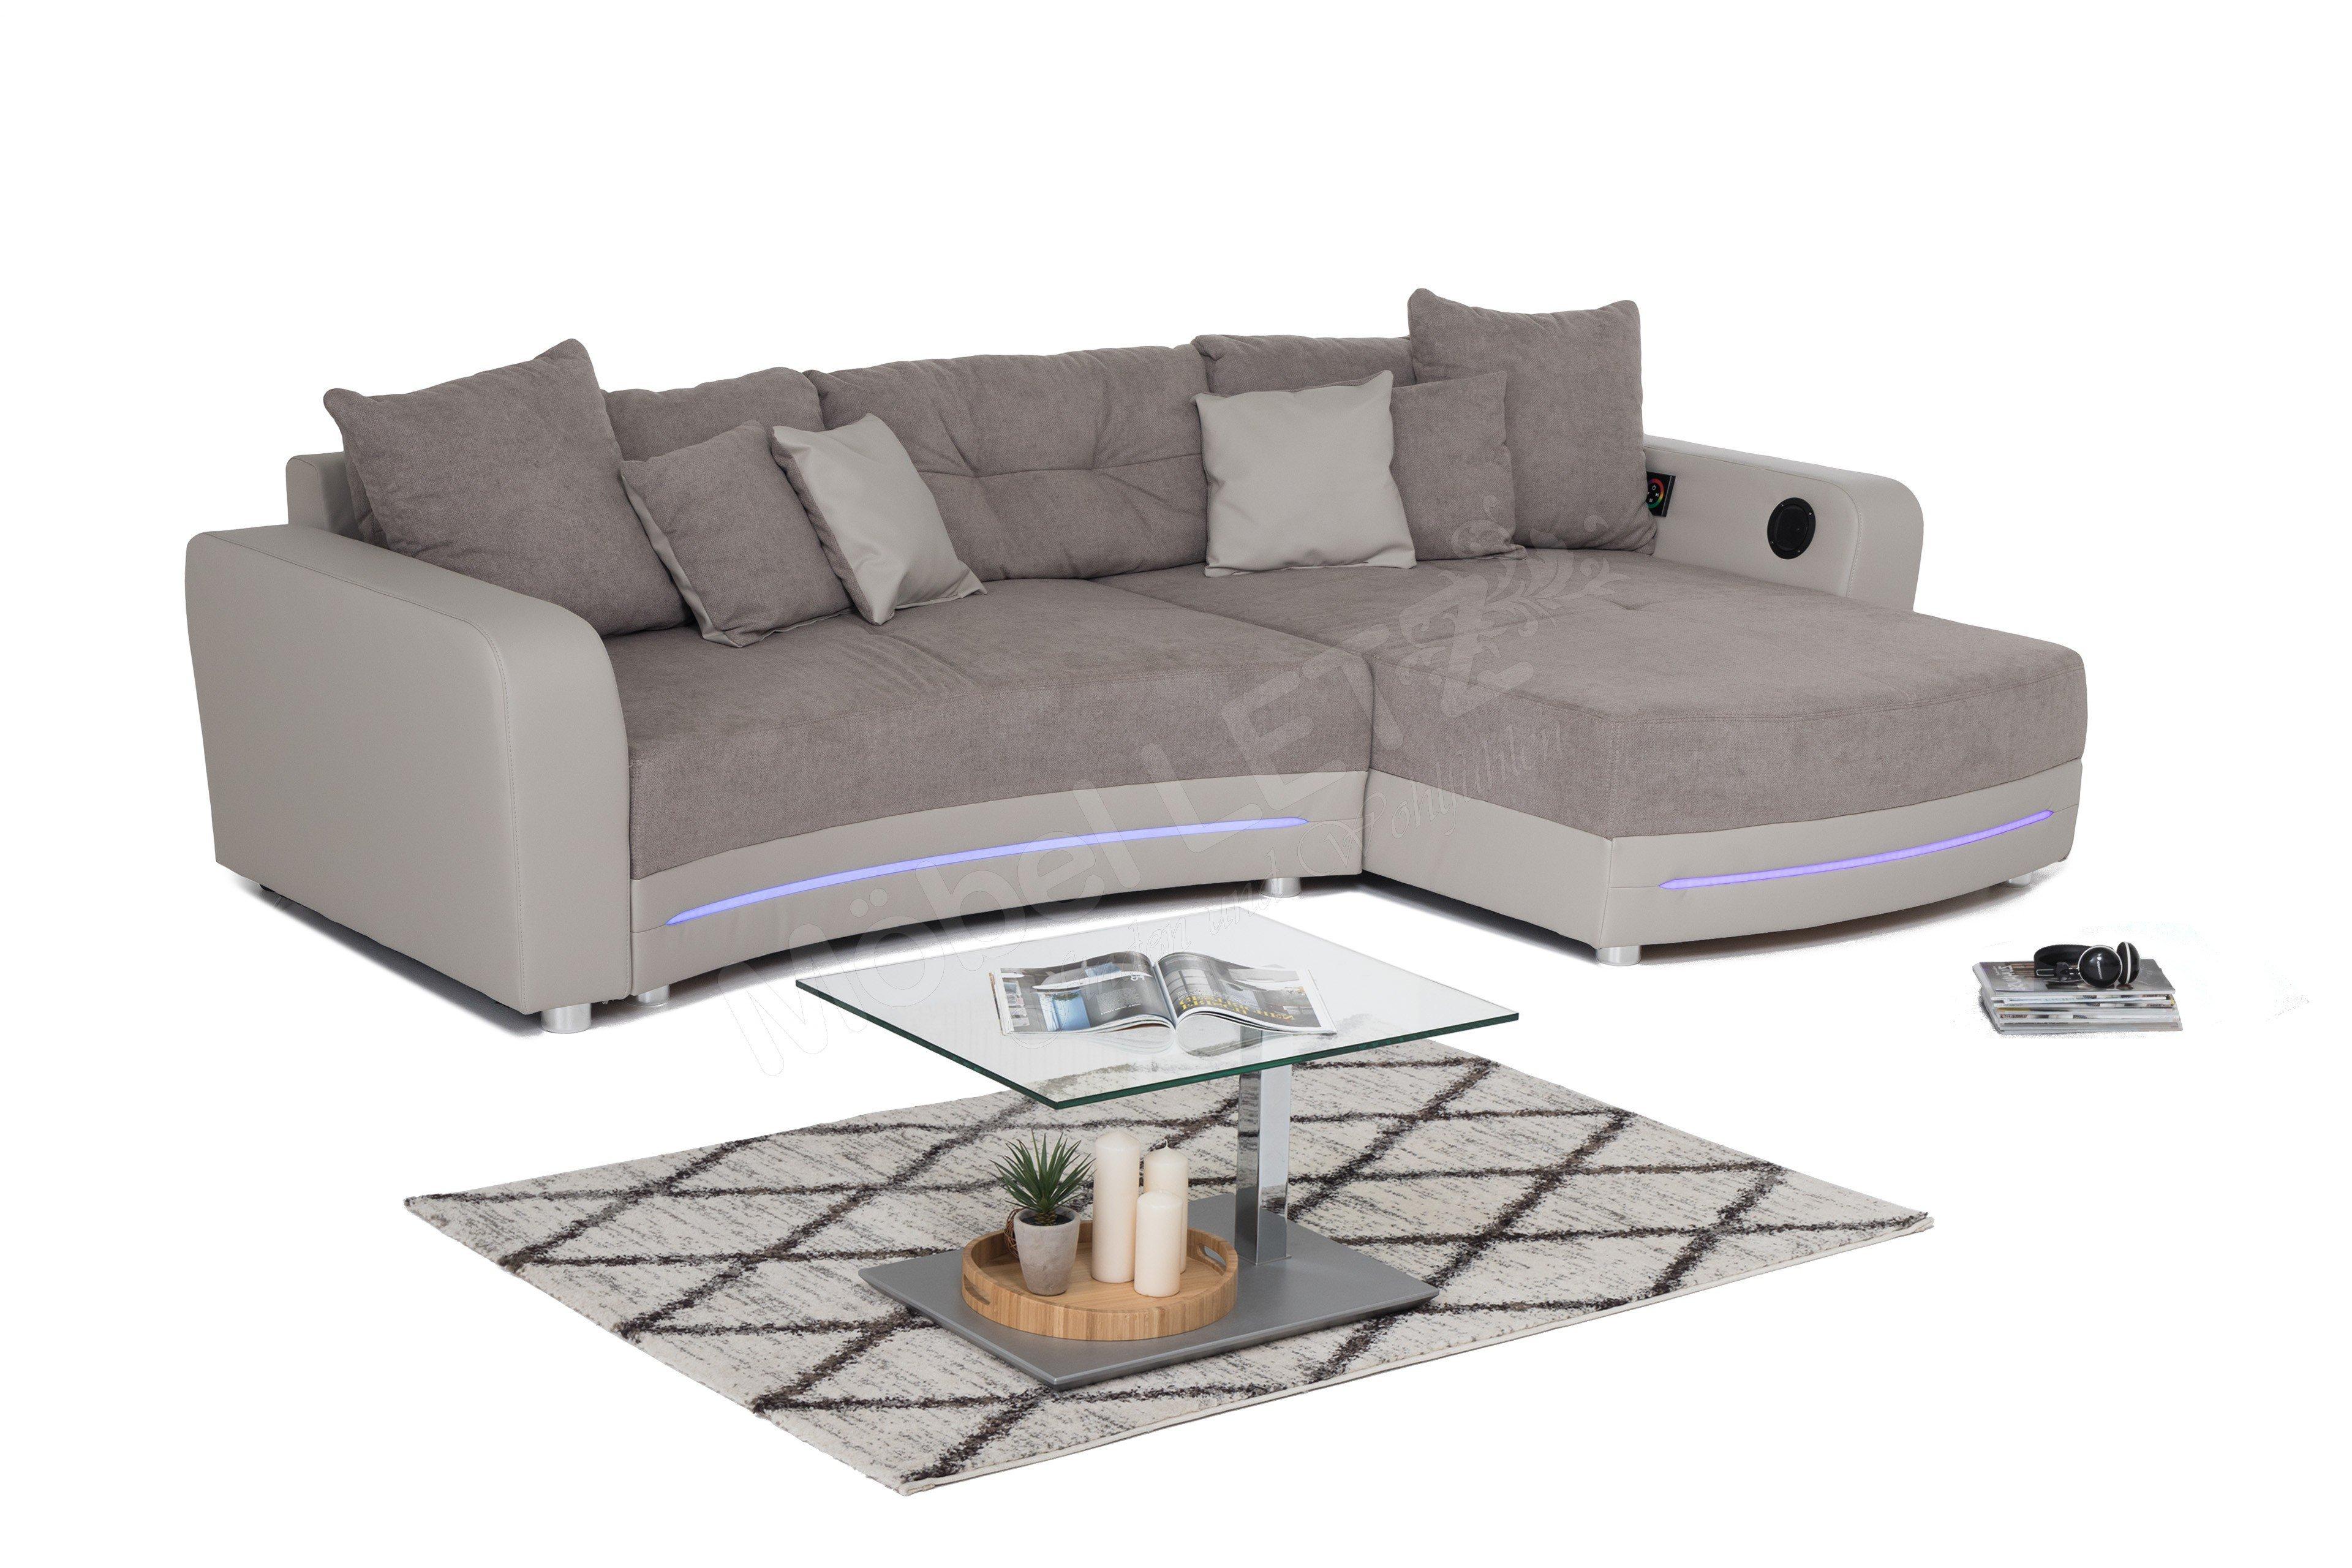 Ecksofa Design. Trendy Tom Tailor Sofa Inspiring Design Couch ...